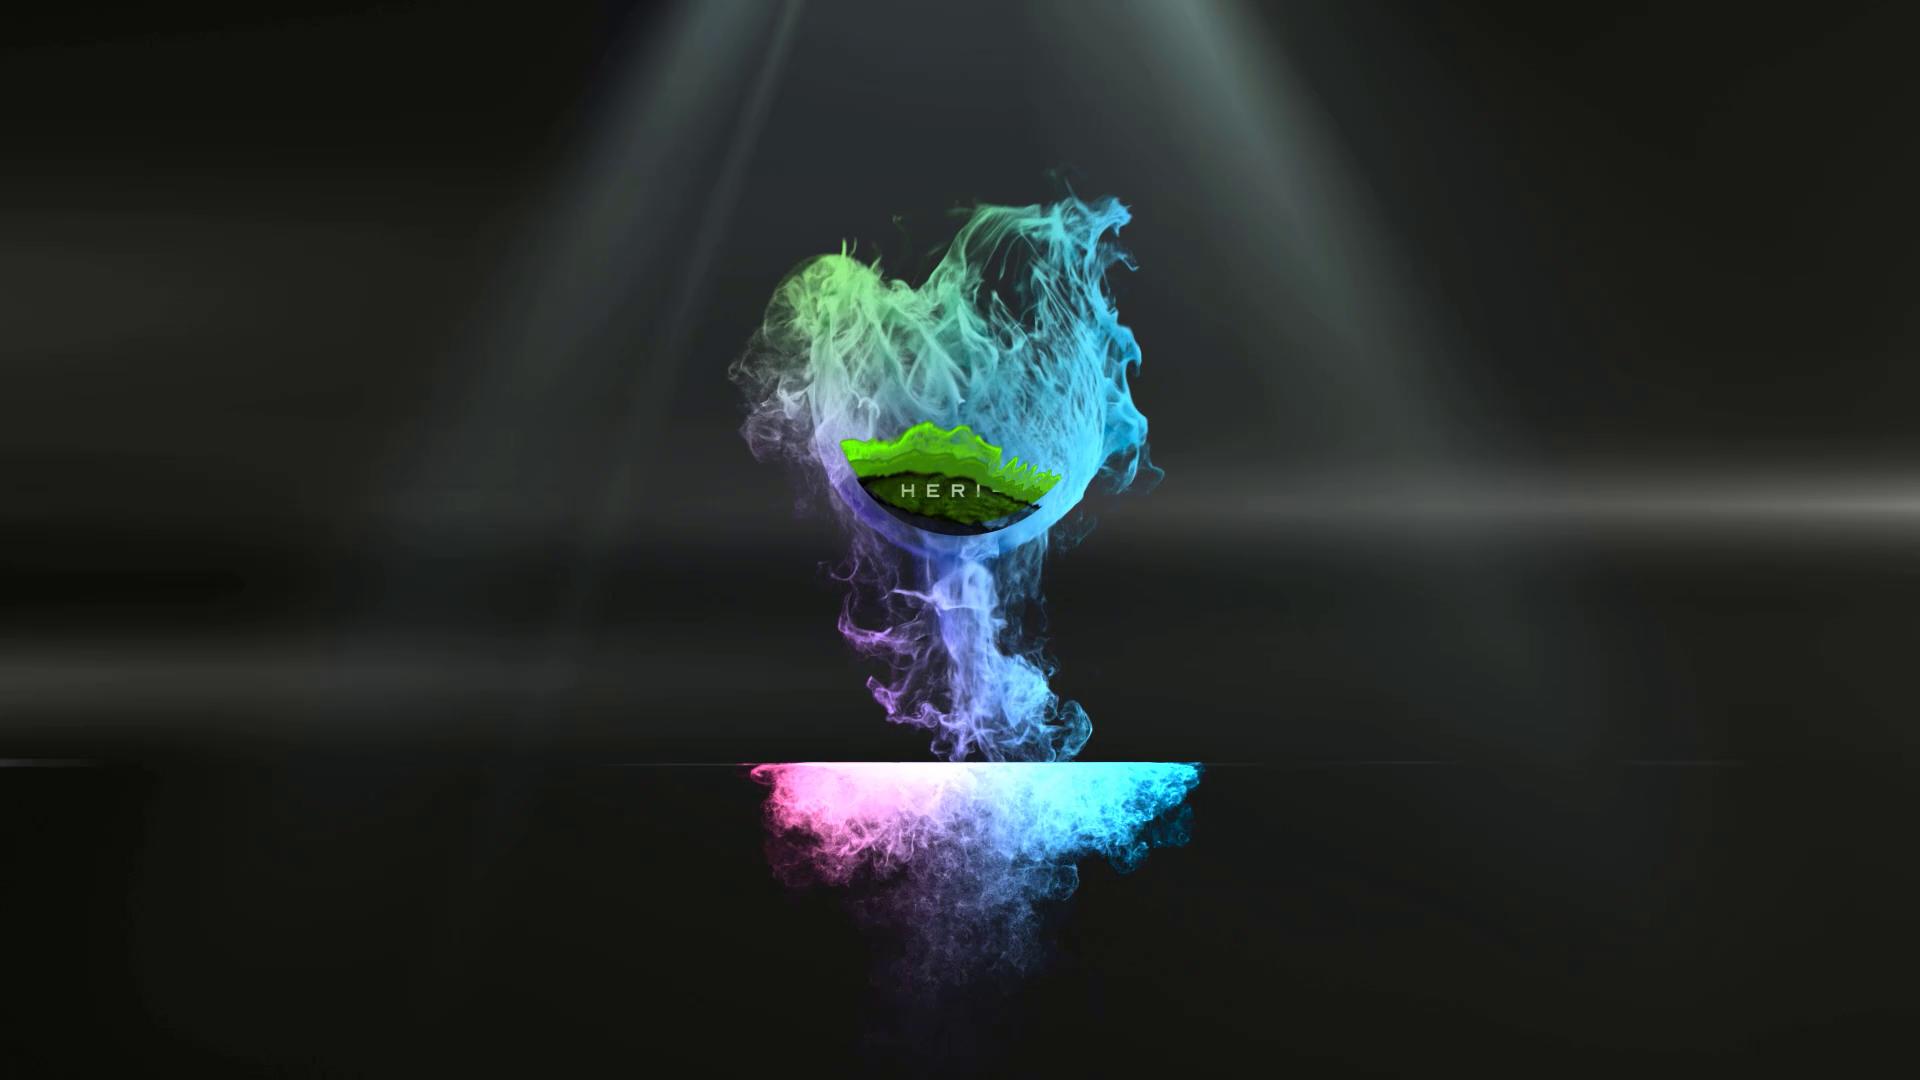 I will create an eye catching smoke logo intro video animation